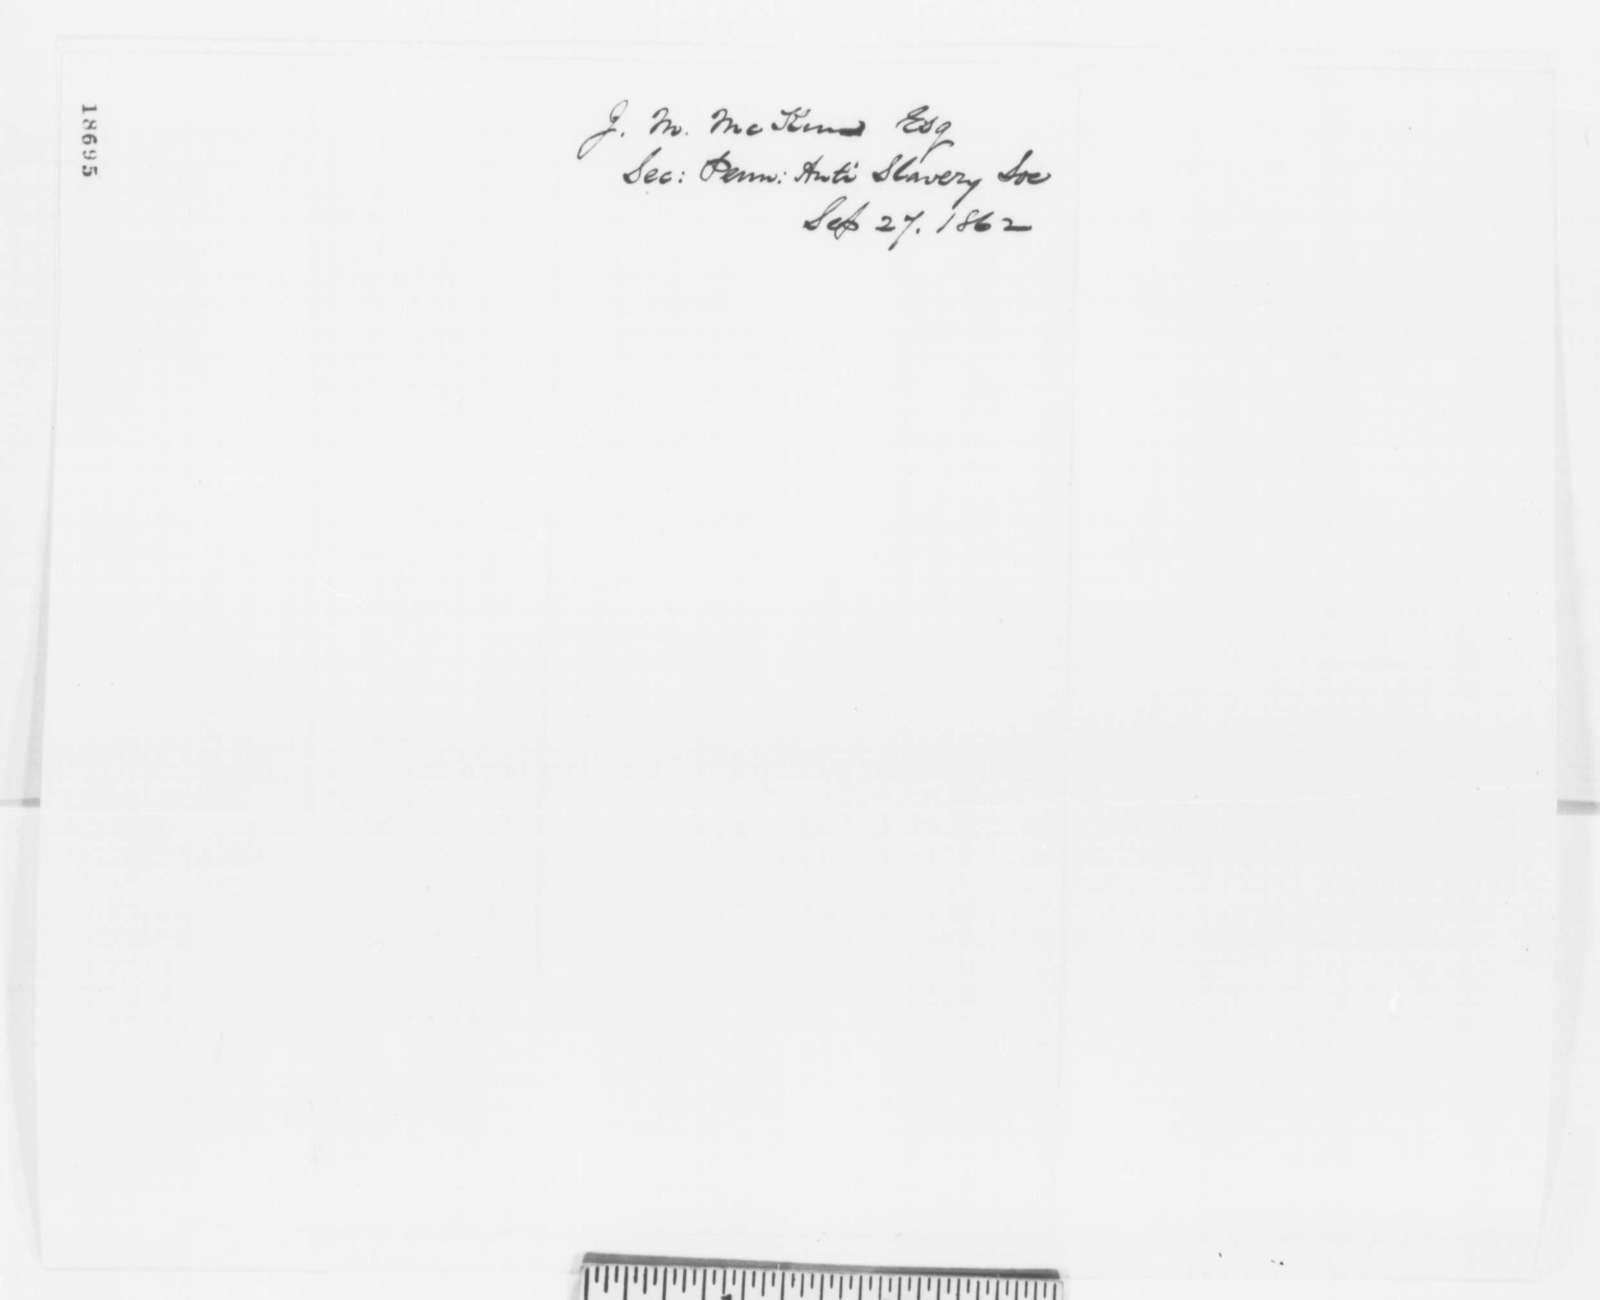 James M. McKim to Abraham Lincoln, Saturday, September 27, 1862  (Sends antislavery resolutions)